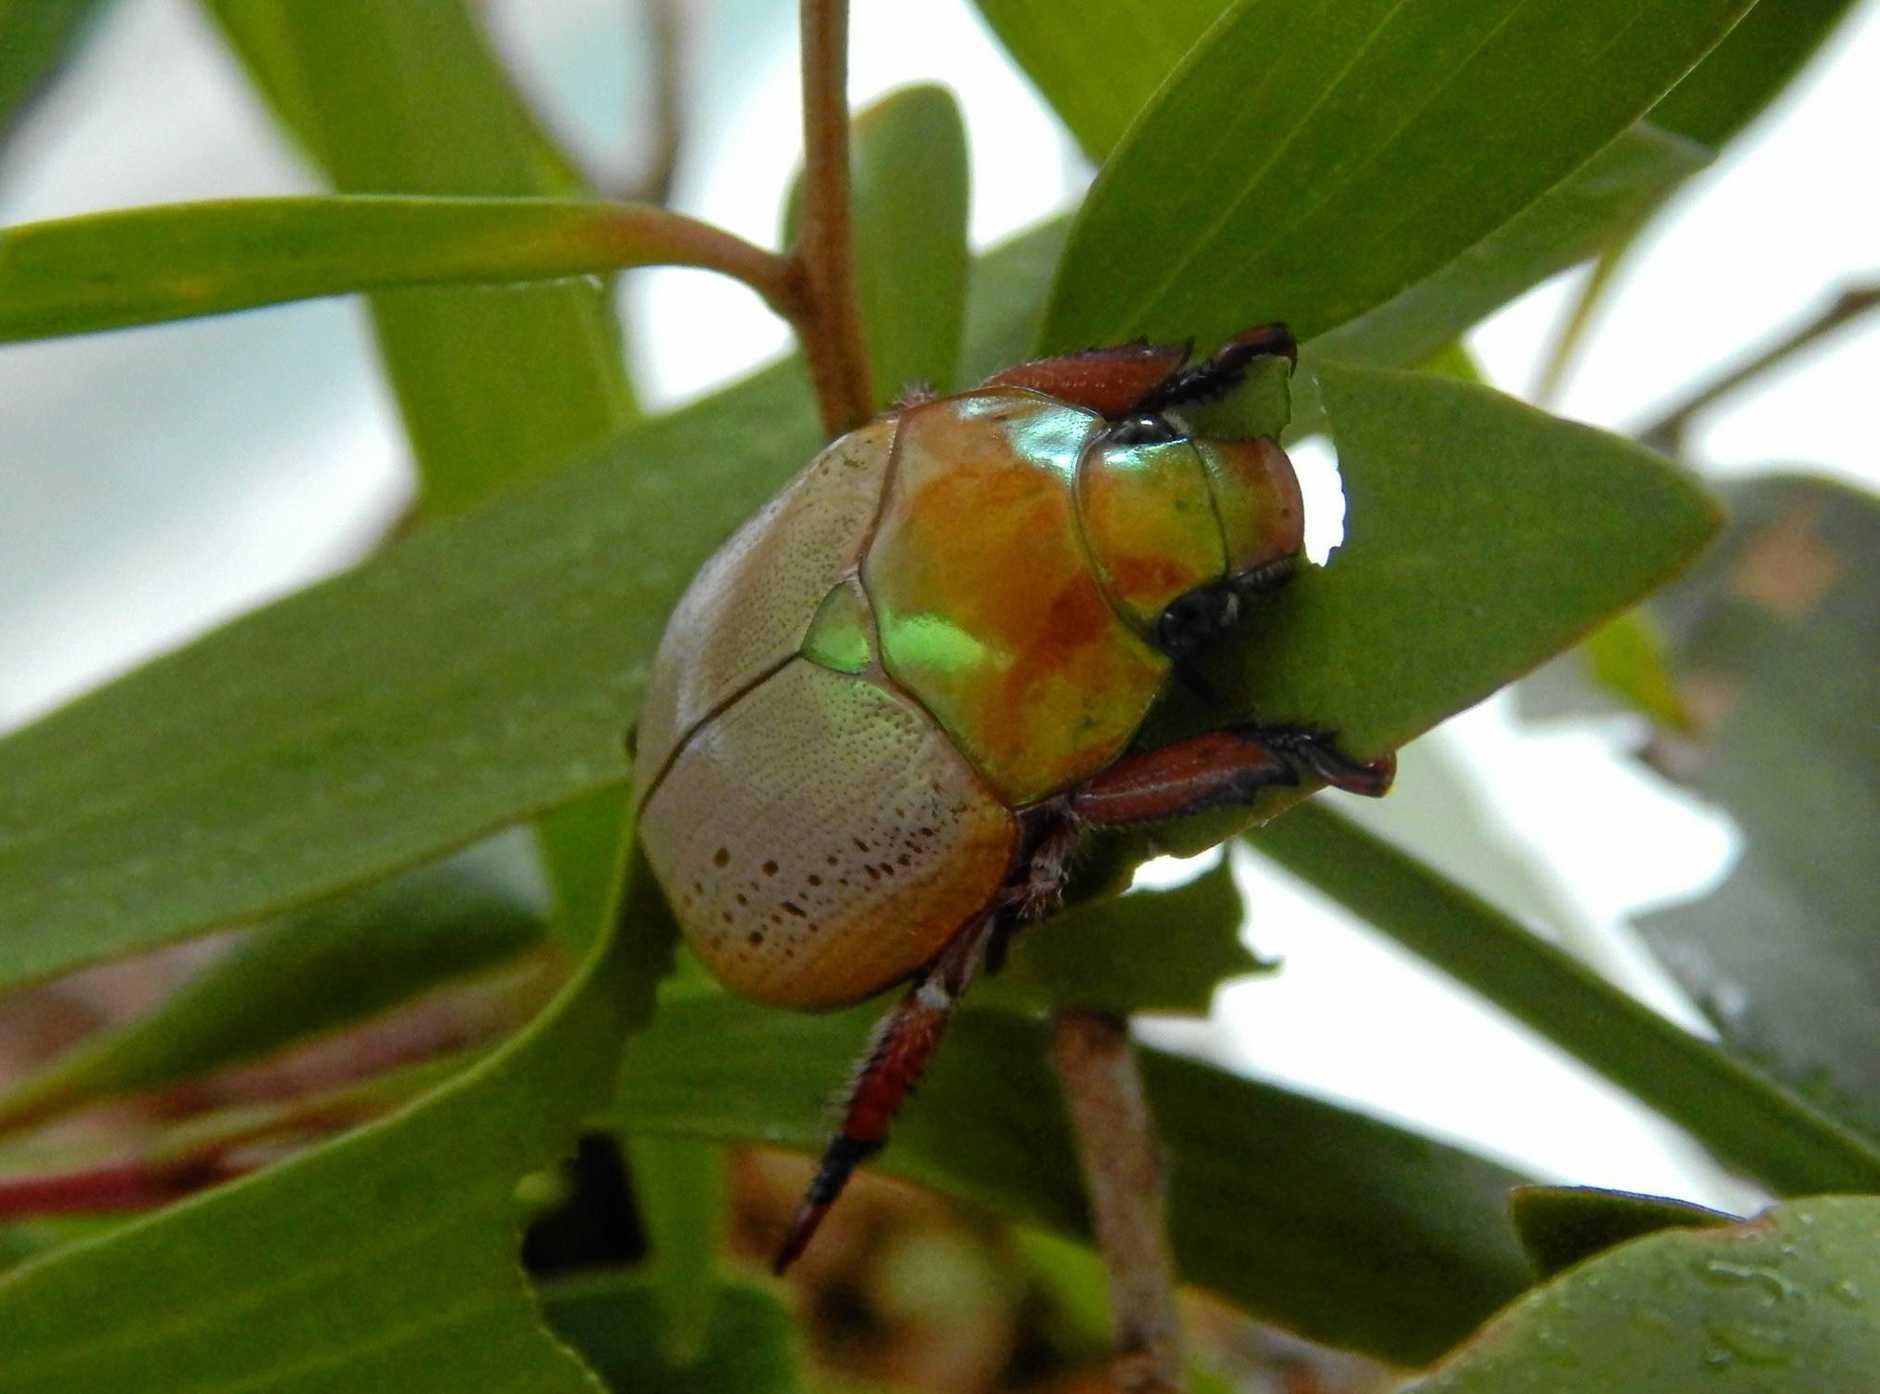 A Golden Christmas Beetle enjoying some eucalyptus leaf.